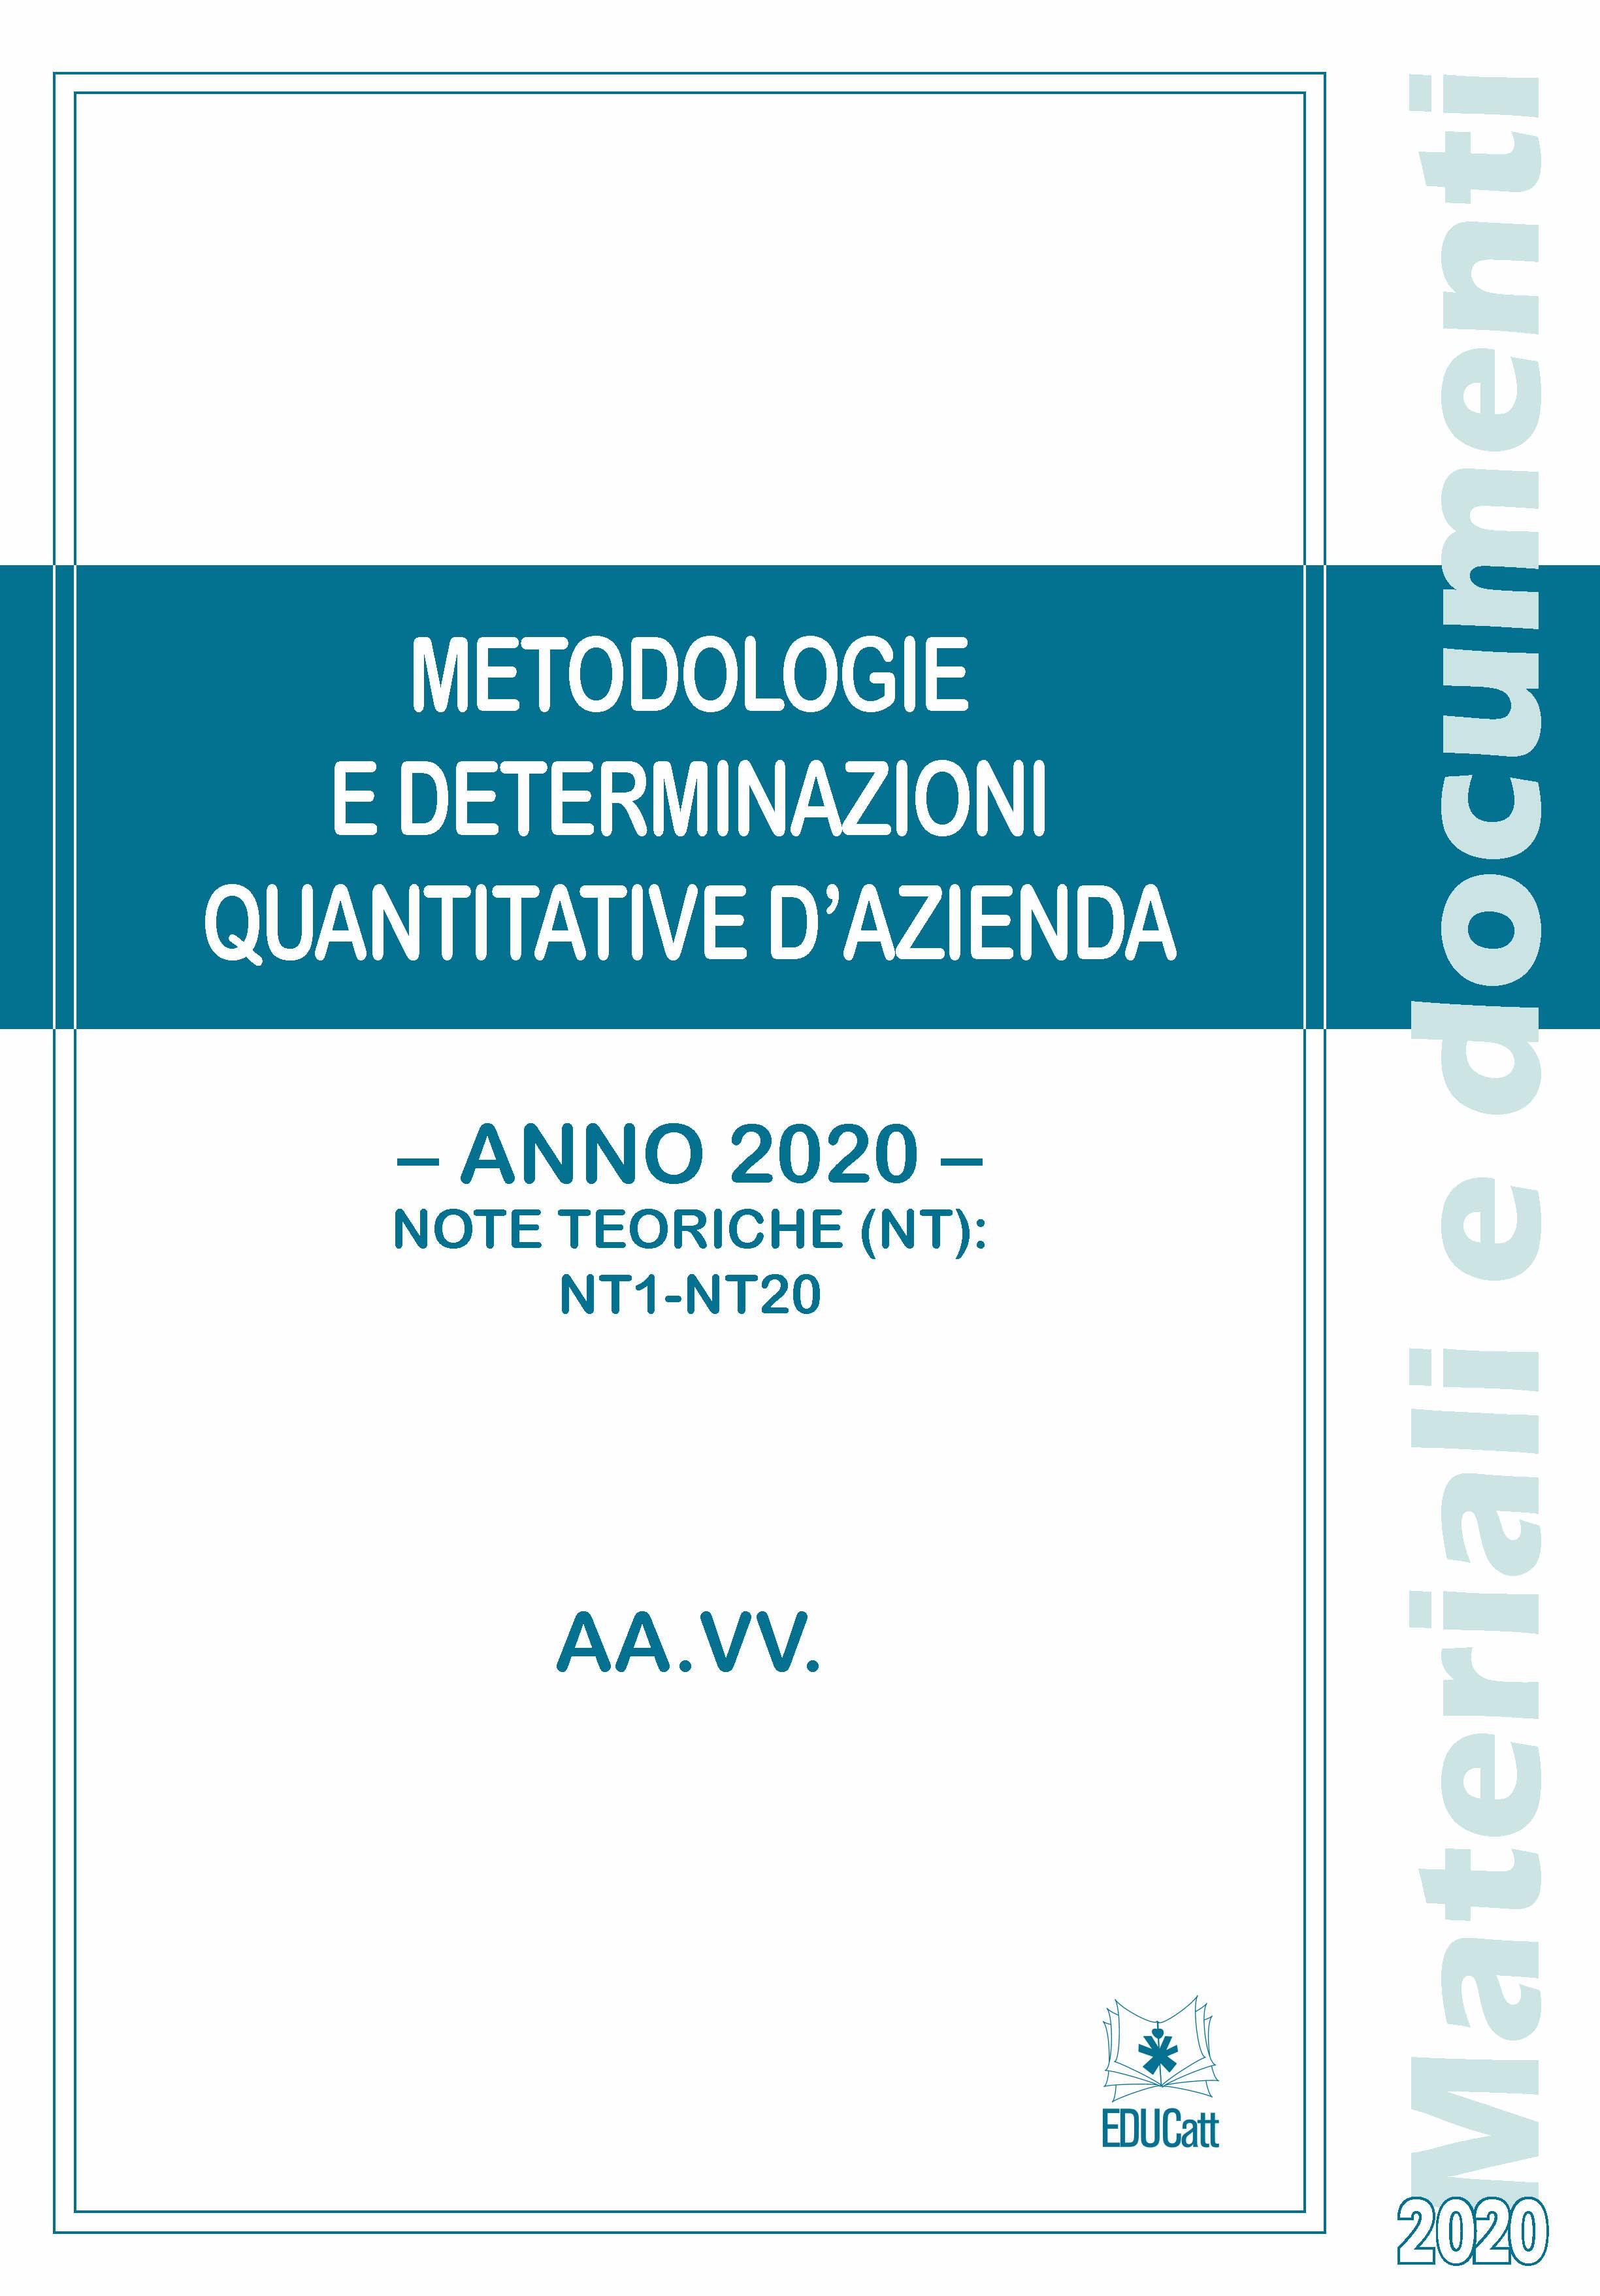 METODOLOGIE E DETERMINAZIONI QUANTITATIVE D'AZIENDA 2020